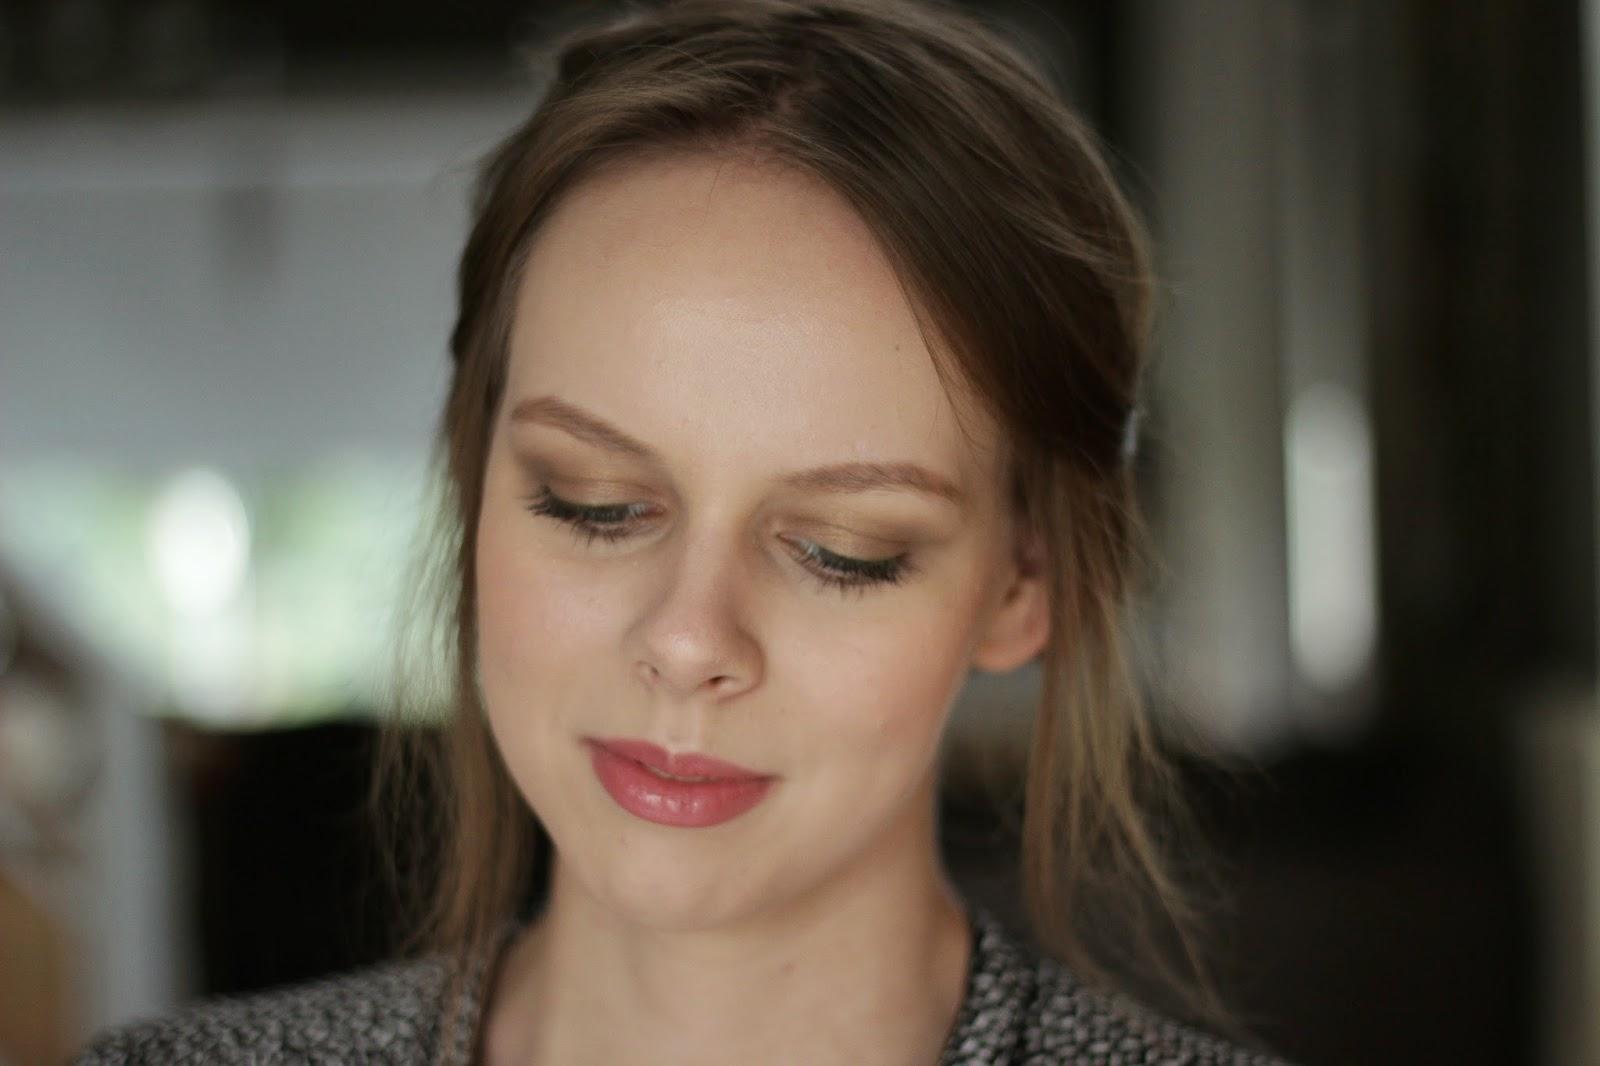 make-up look london feel, neutrale make-up look